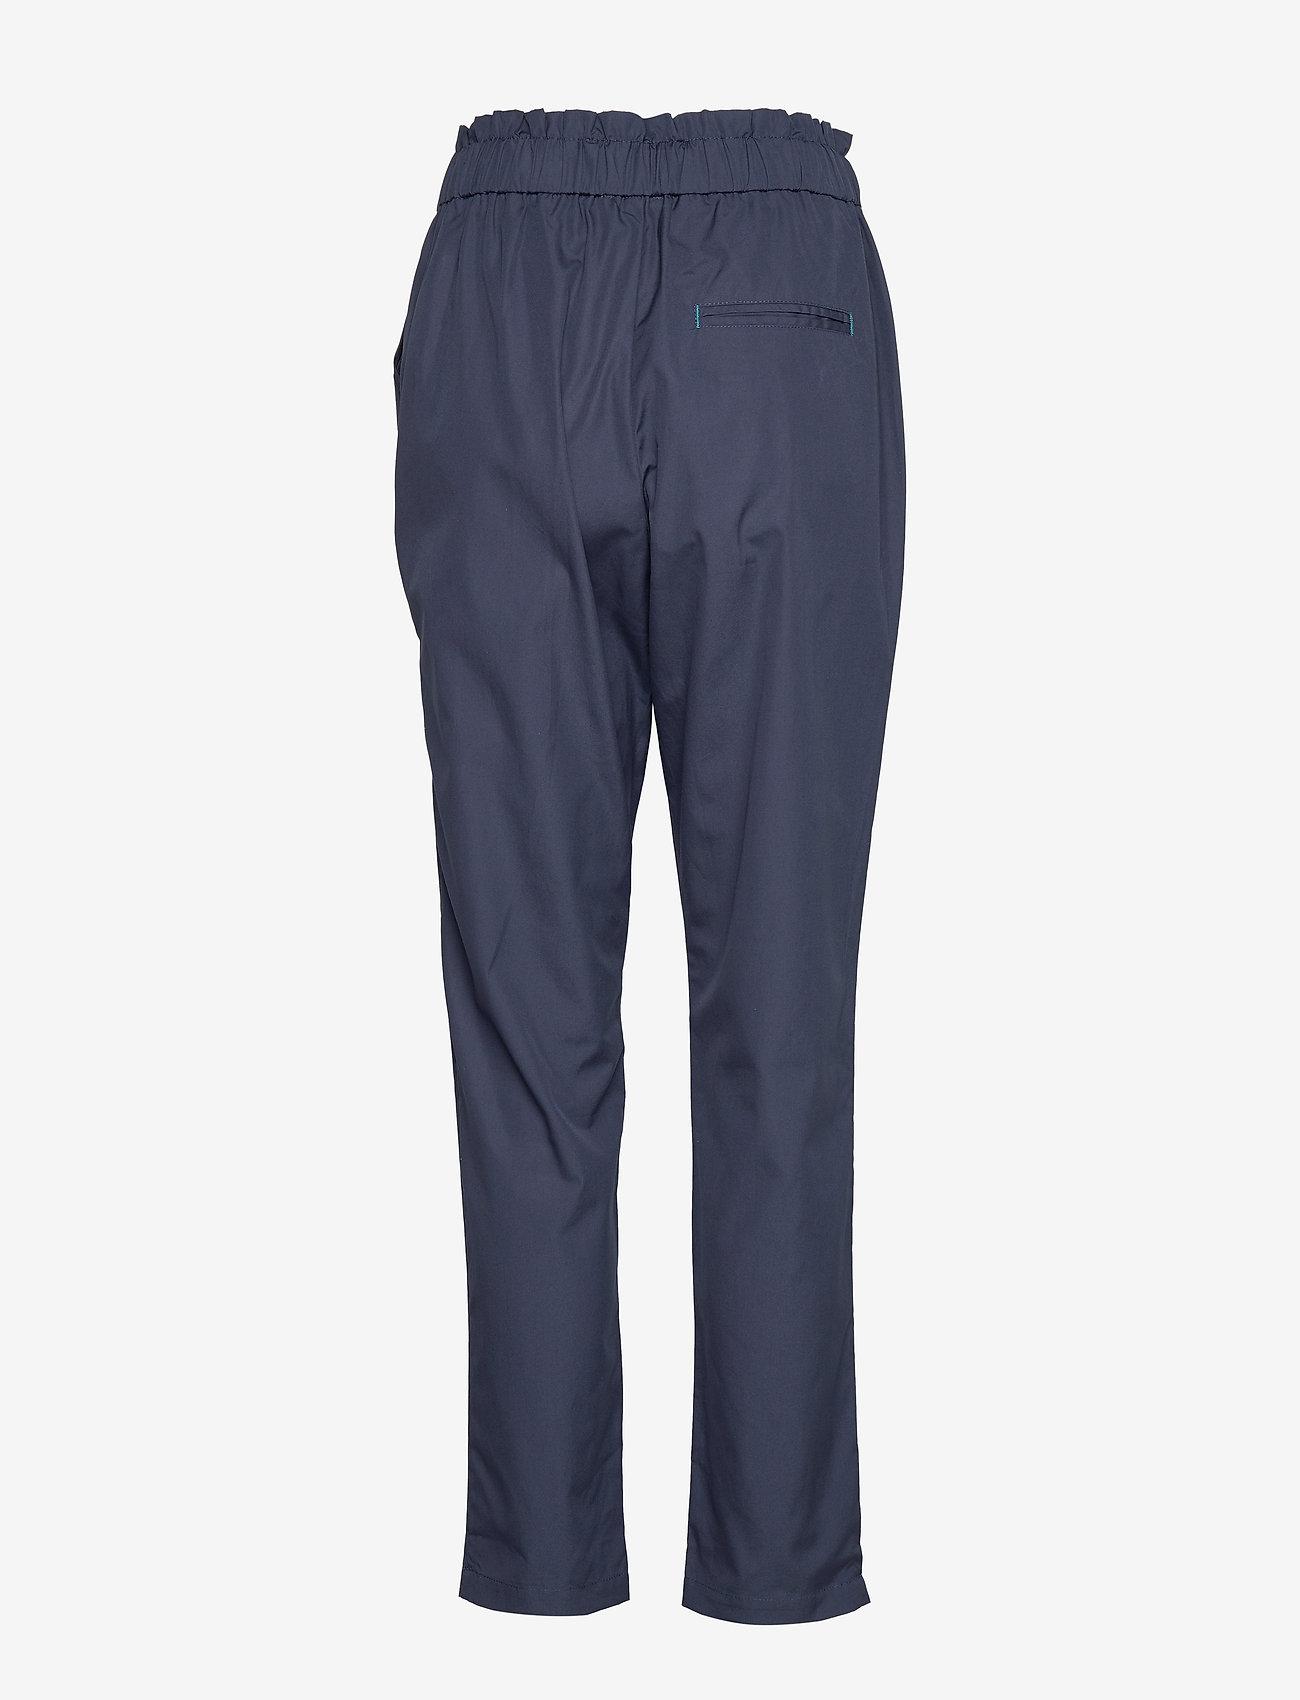 Noa Noa - Trousers - casual broeken - dress blues - 1